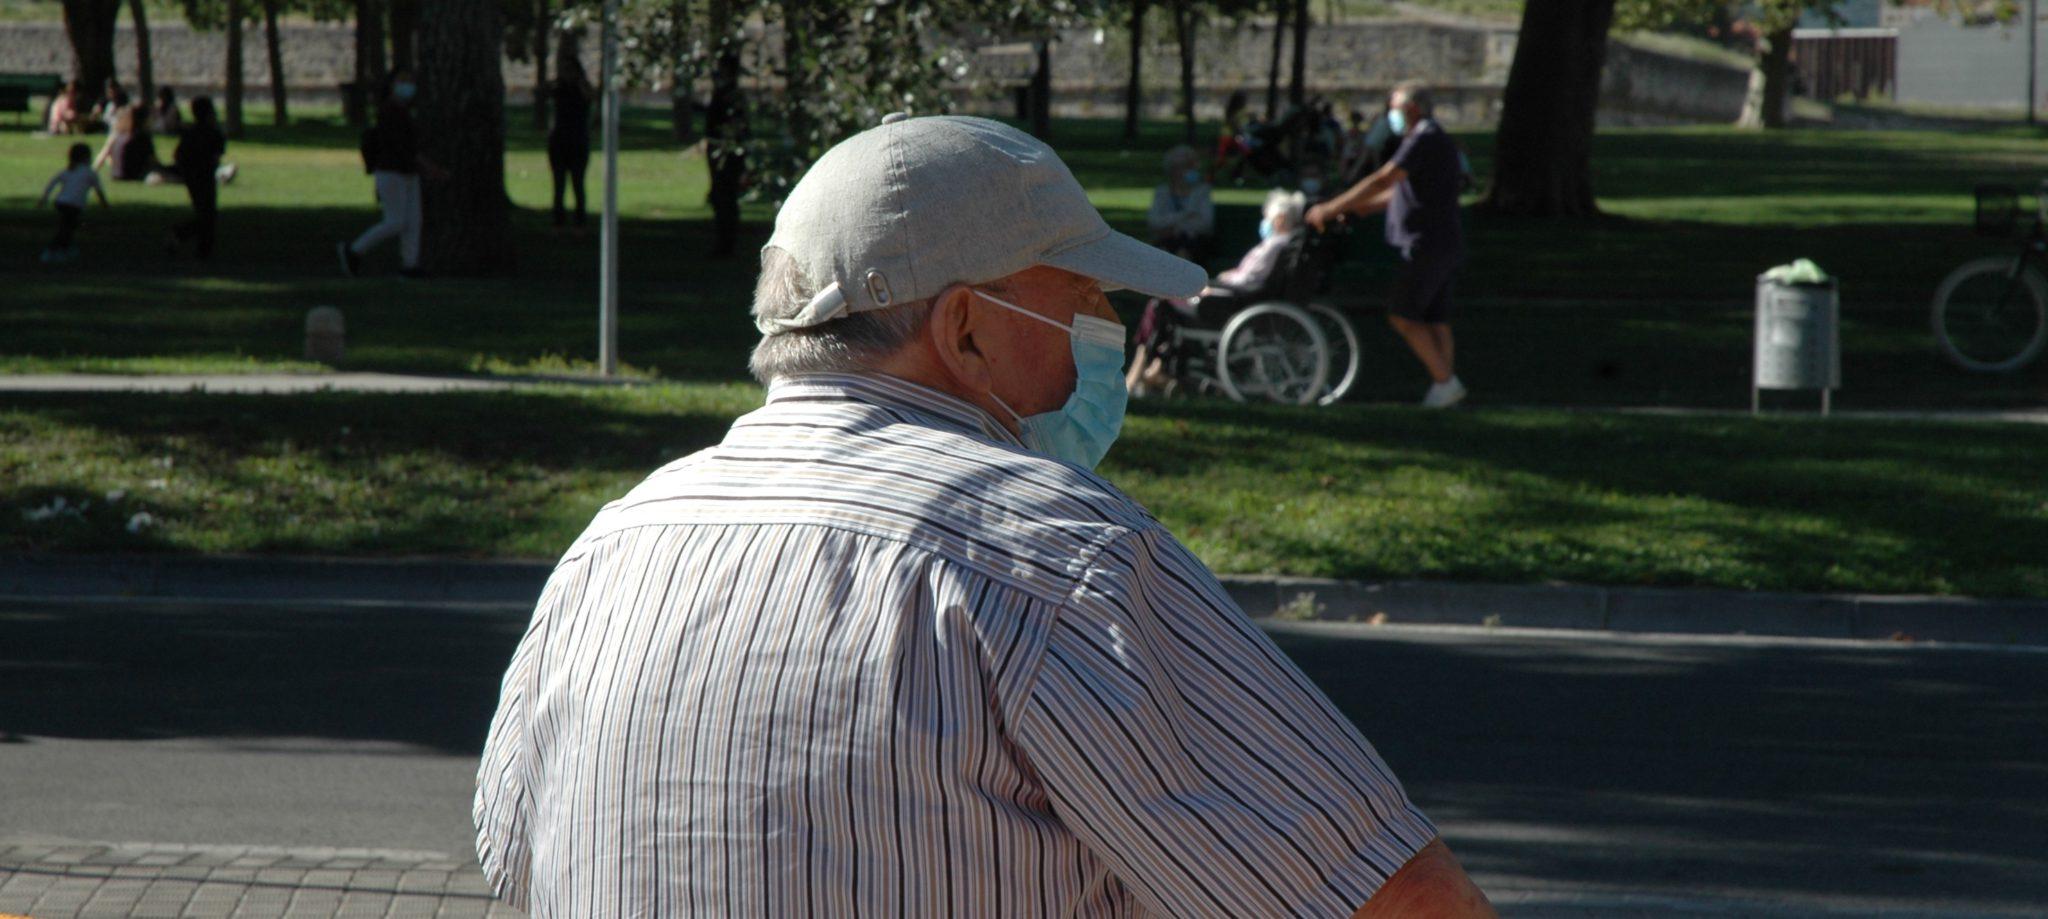 Salidas De Residentes En Unidades Para Personas Con Dependencia